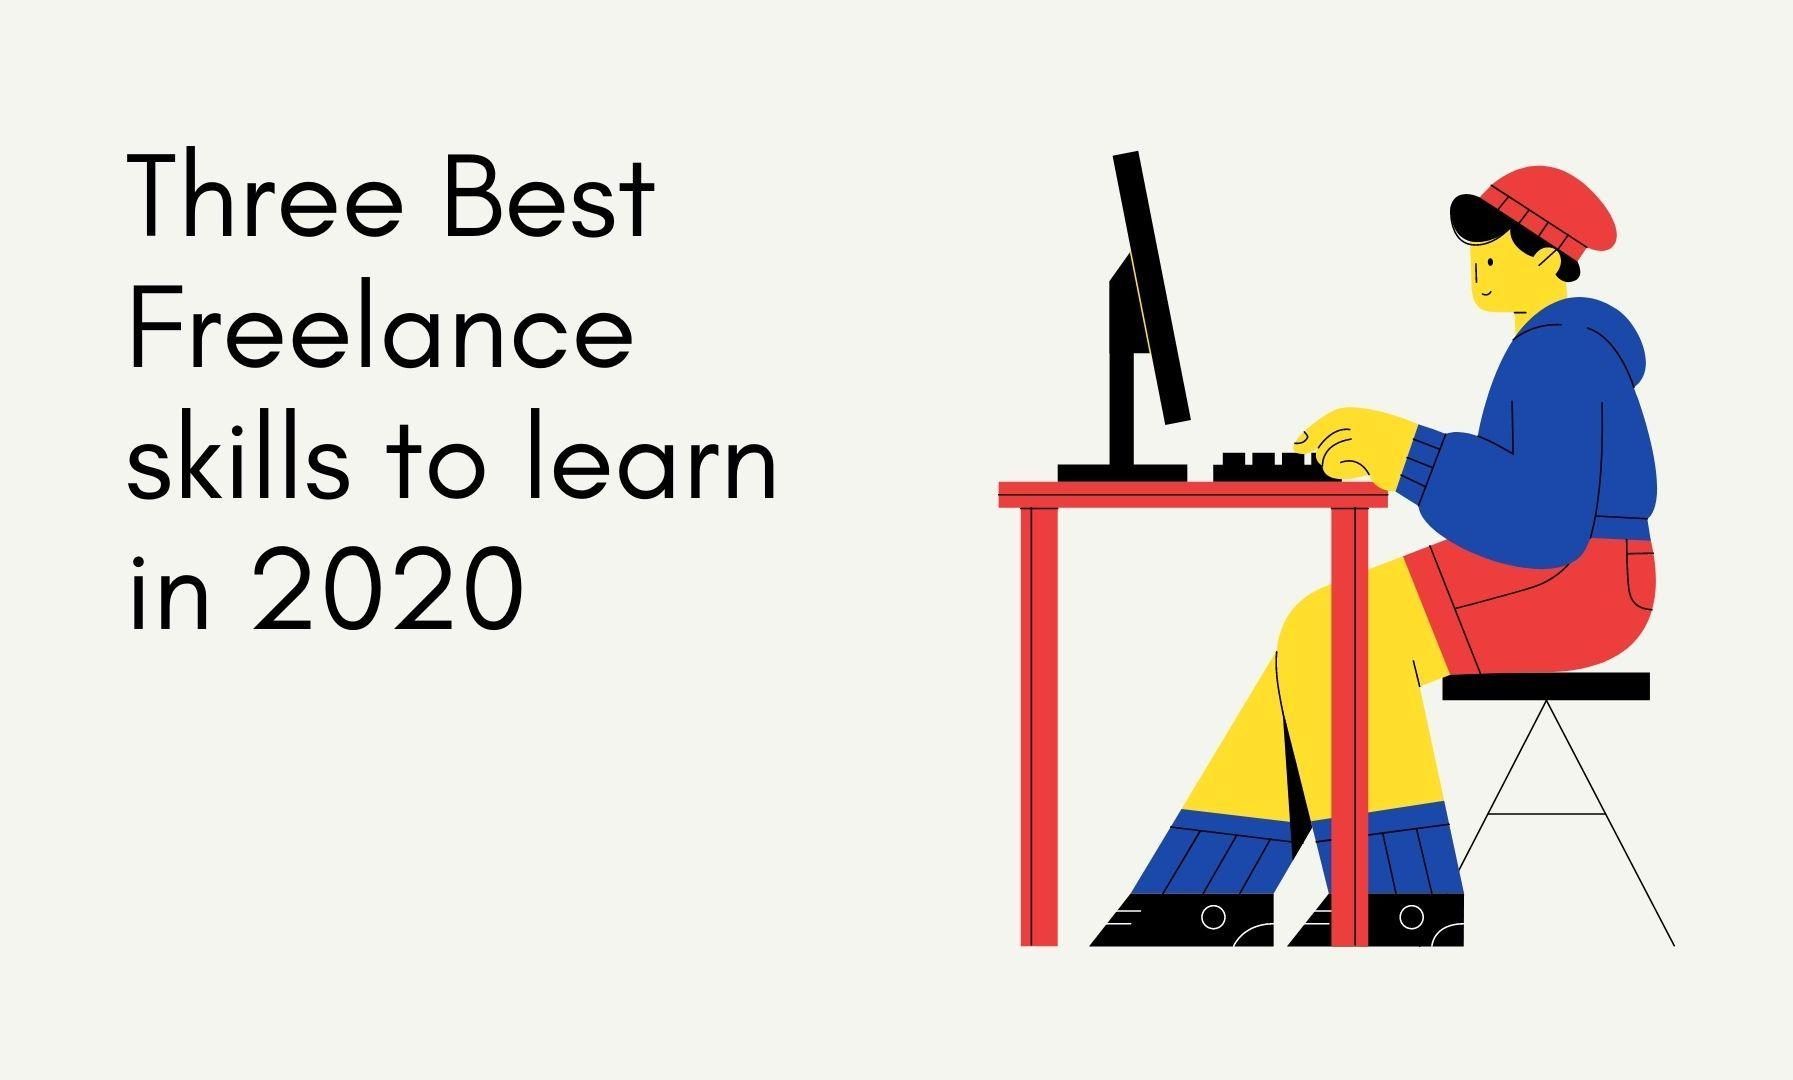 Three Best Freelance skills to learn in 2020